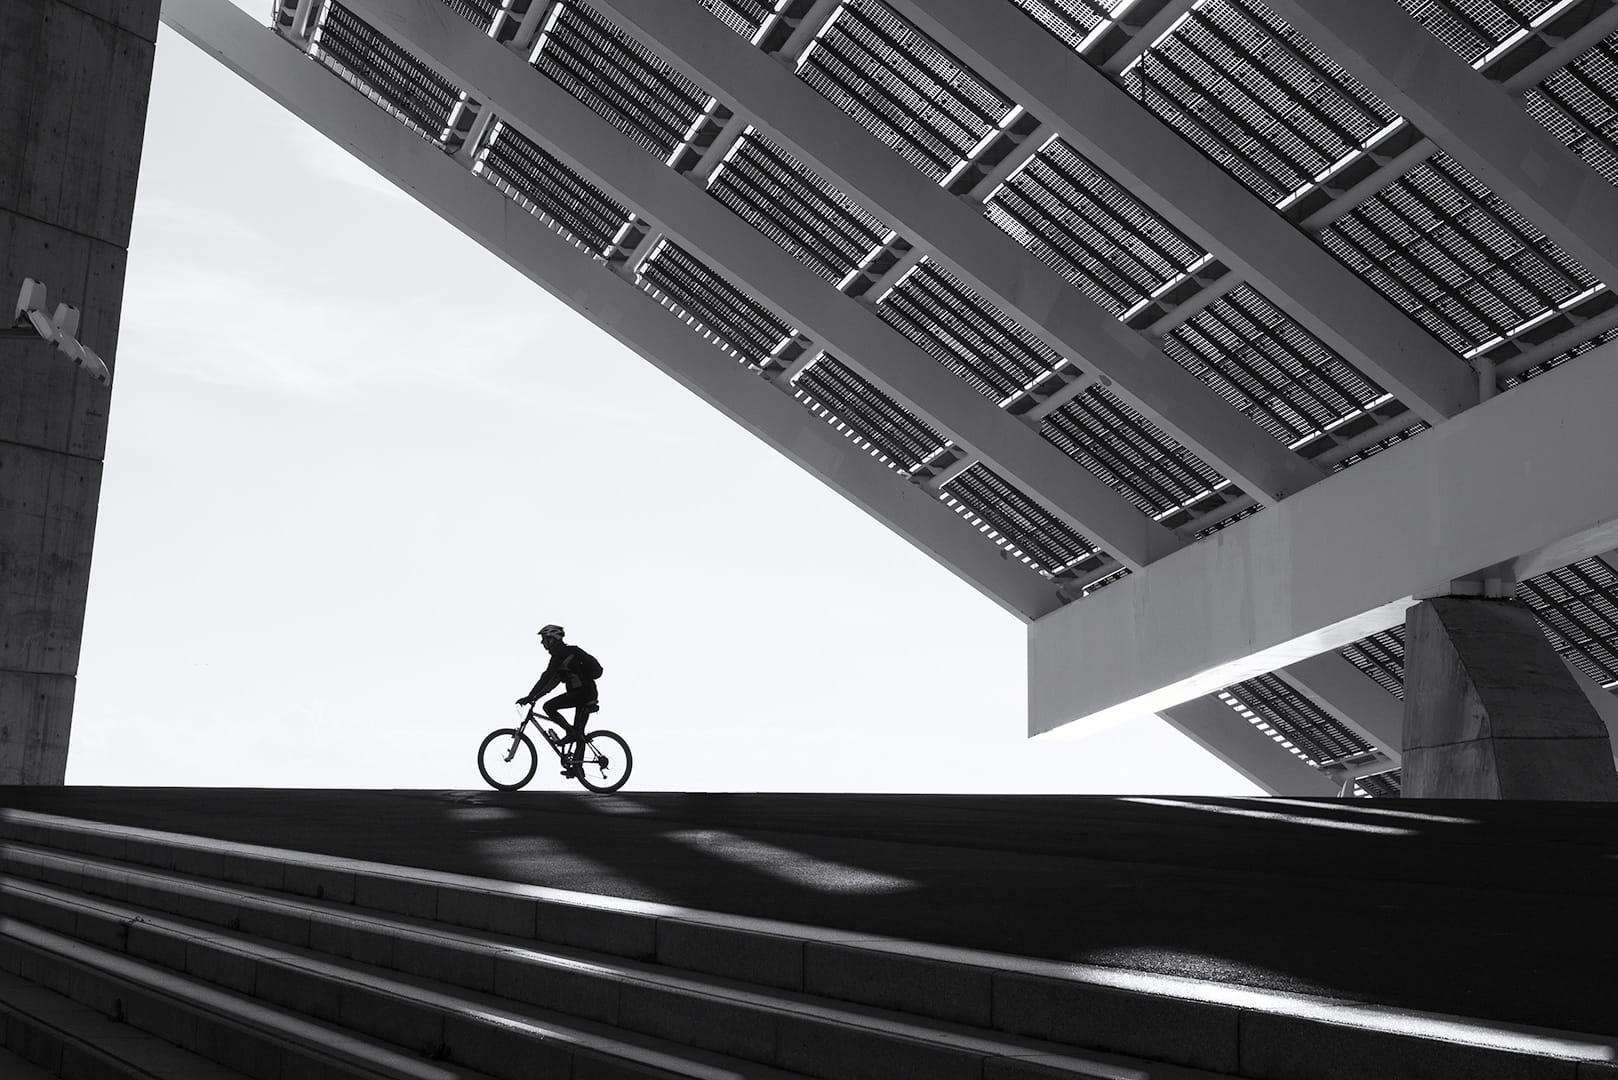 En bici